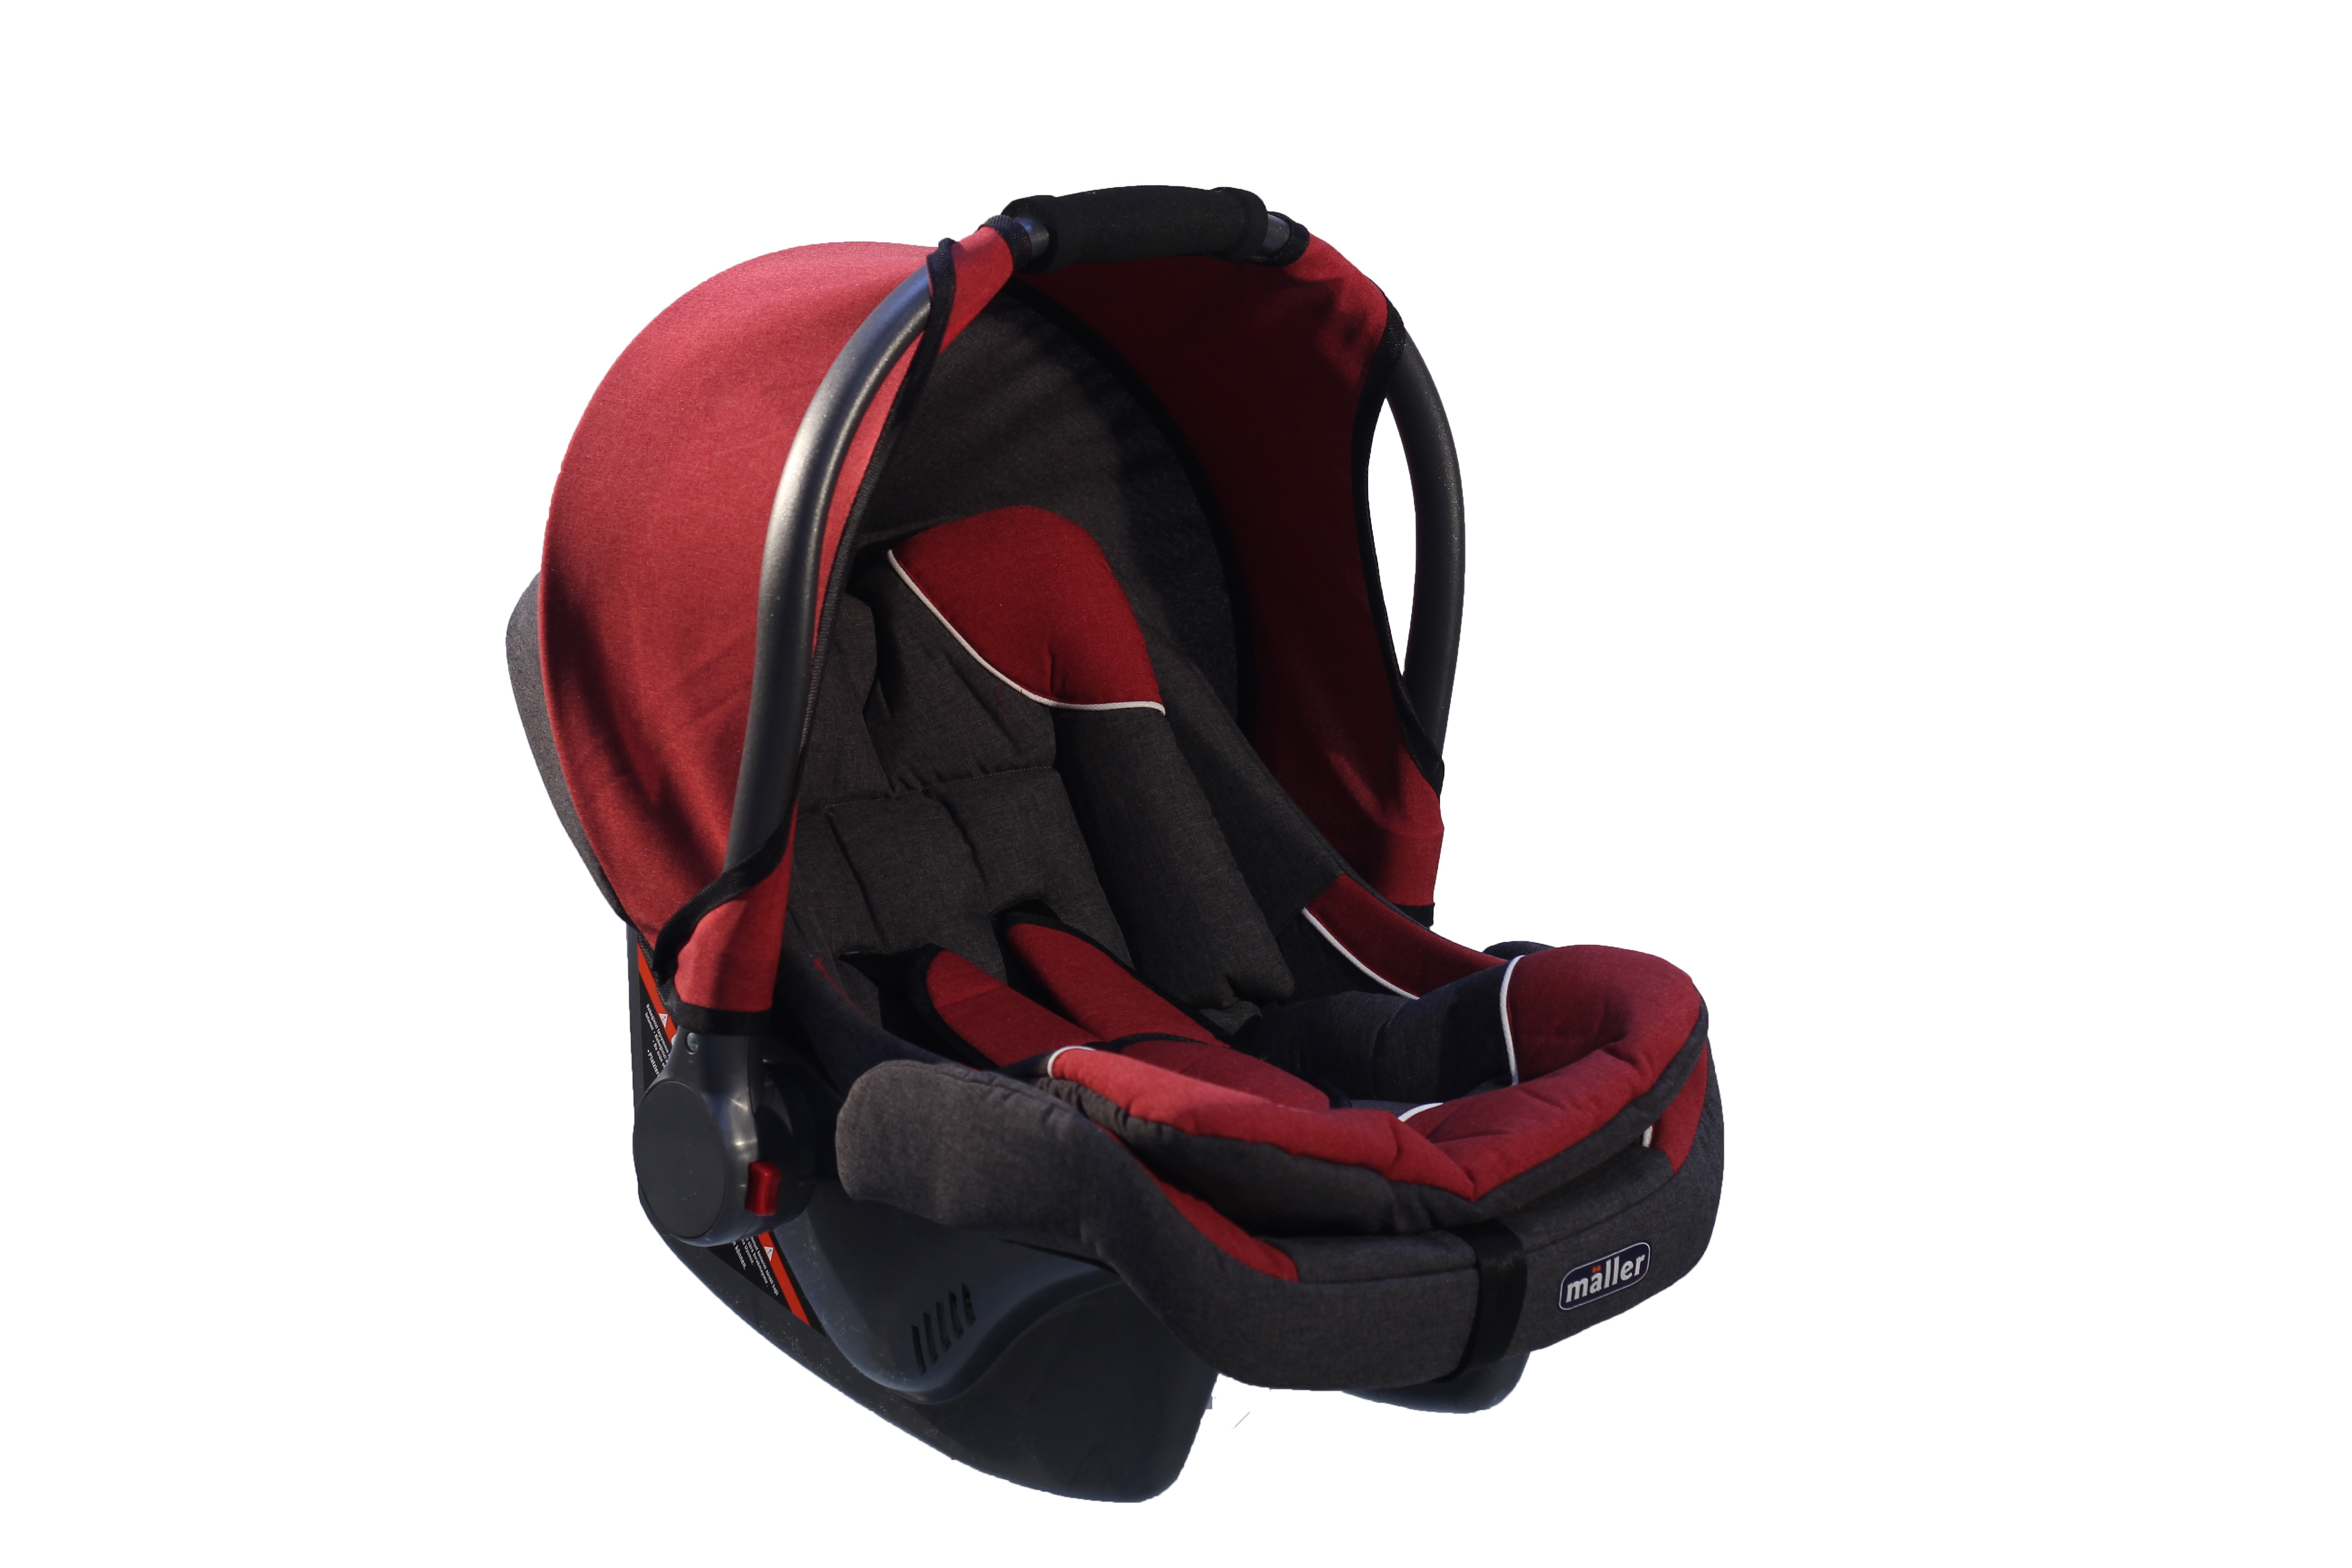 Maller Baby Nexia 0-13kg Taşıma Siyah Kırmızı